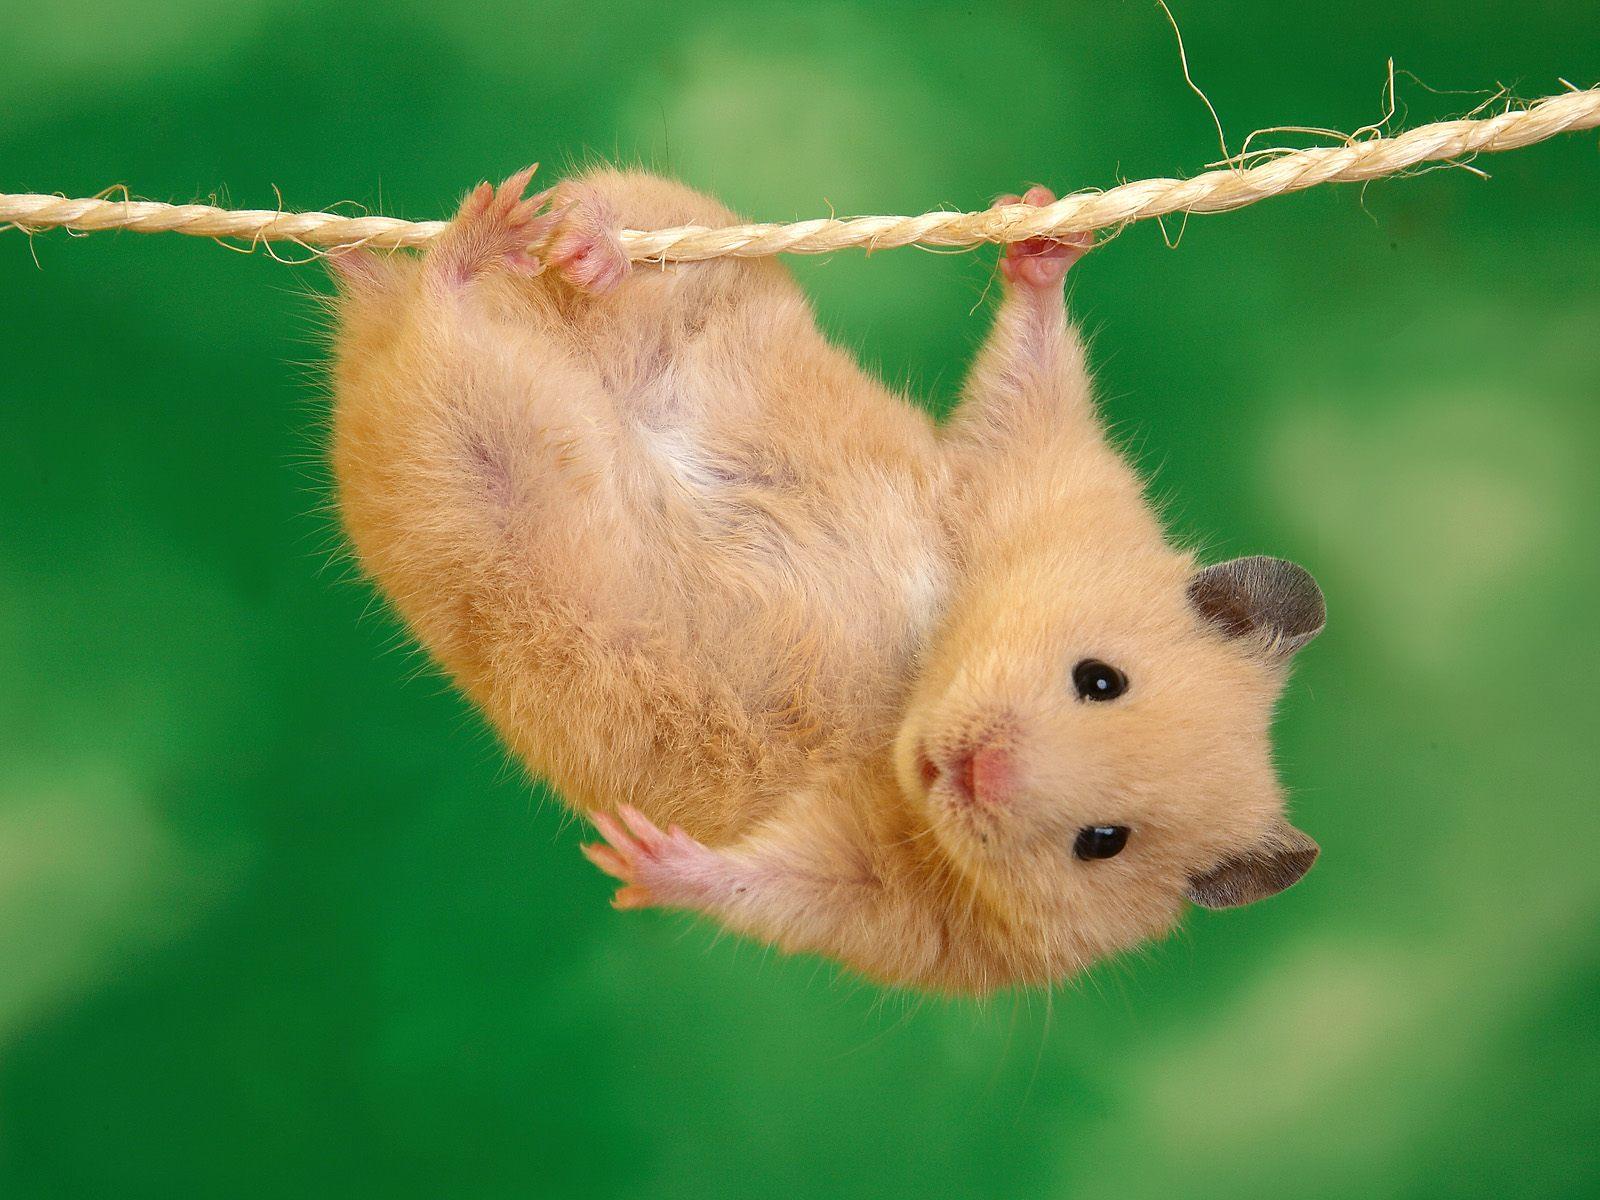 http://1.bp.blogspot.com/_m1Z6uxpmlU8/TSXmHHN1ICI/AAAAAAAADCc/JPm12IjczGs/s1600/animal_0026.jpg